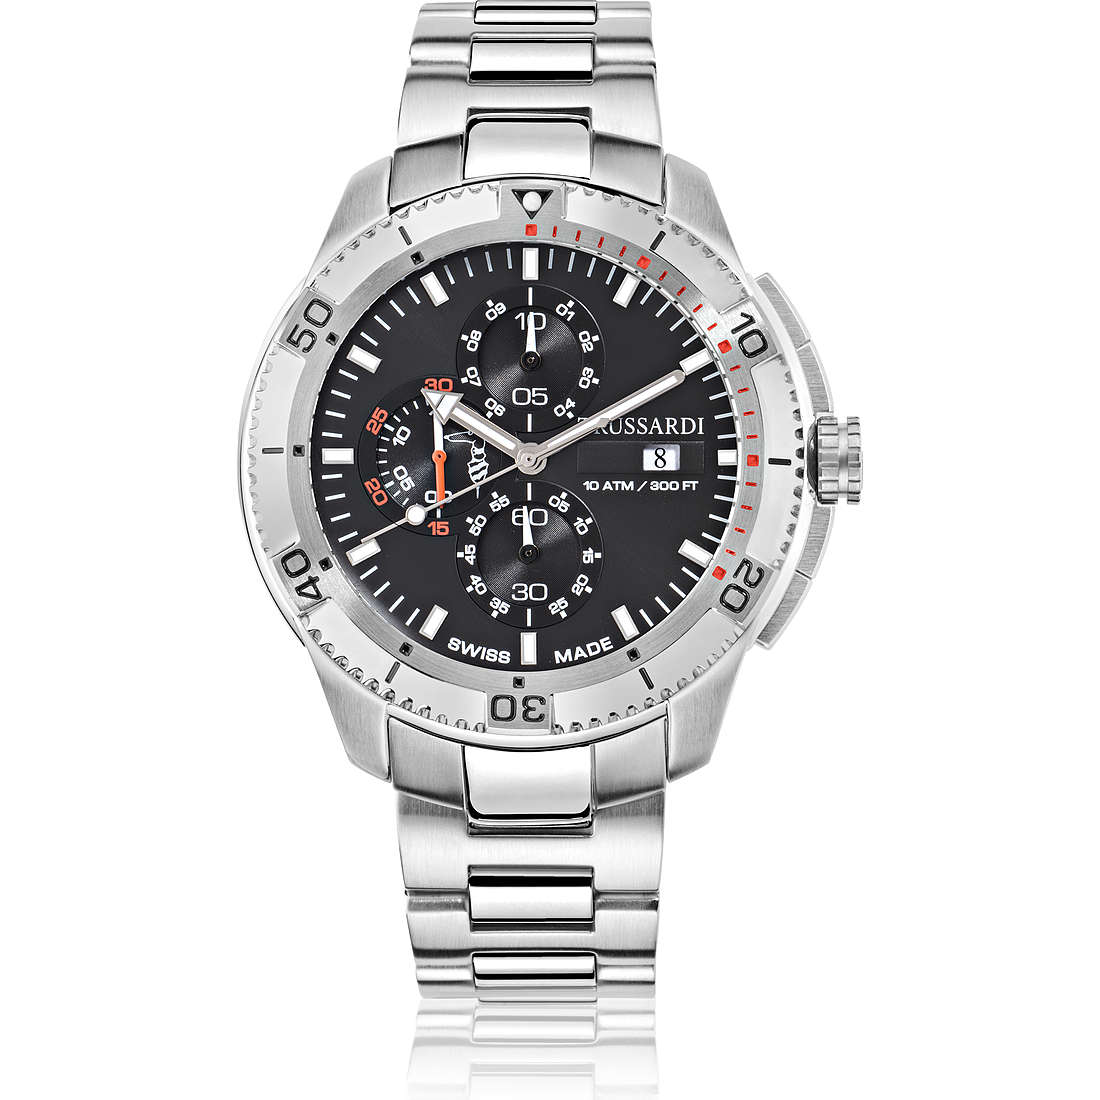 watch chronograph man Trussardi Sportsman R2473601001